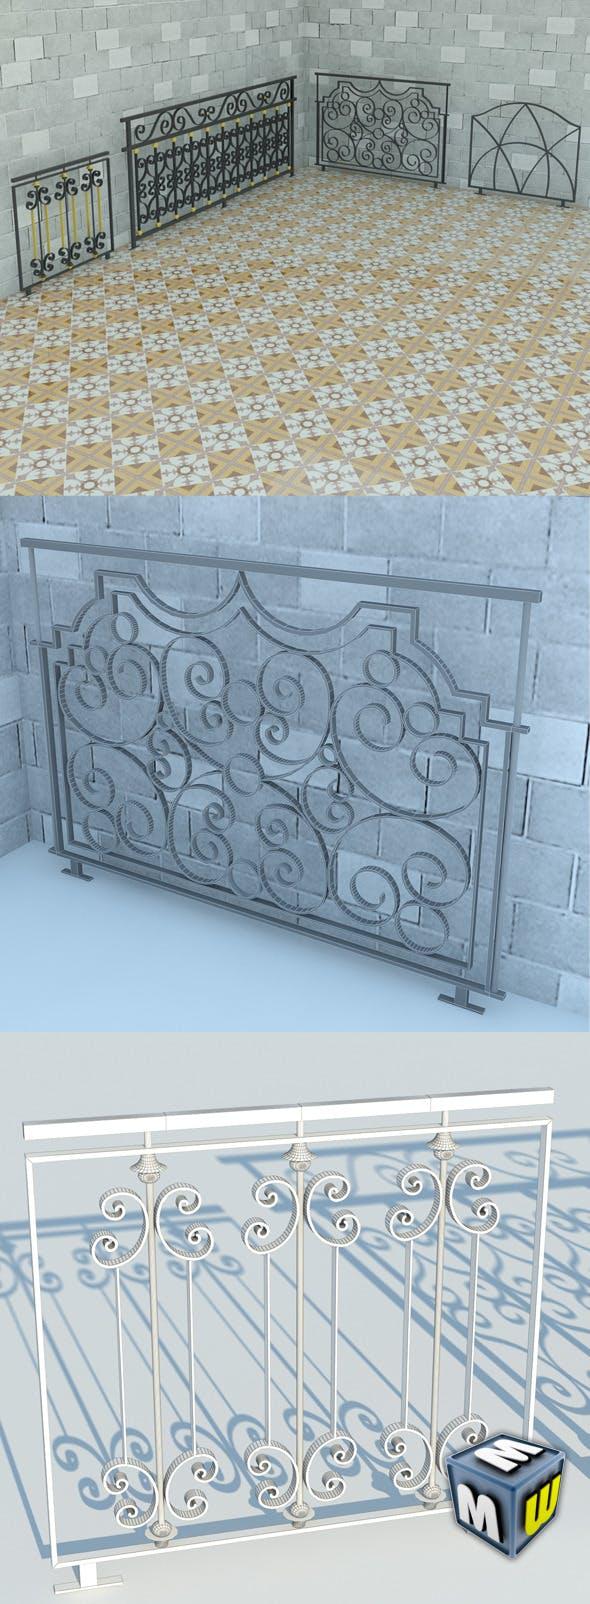 Railing Art Max 2011 - 3DOcean Item for Sale